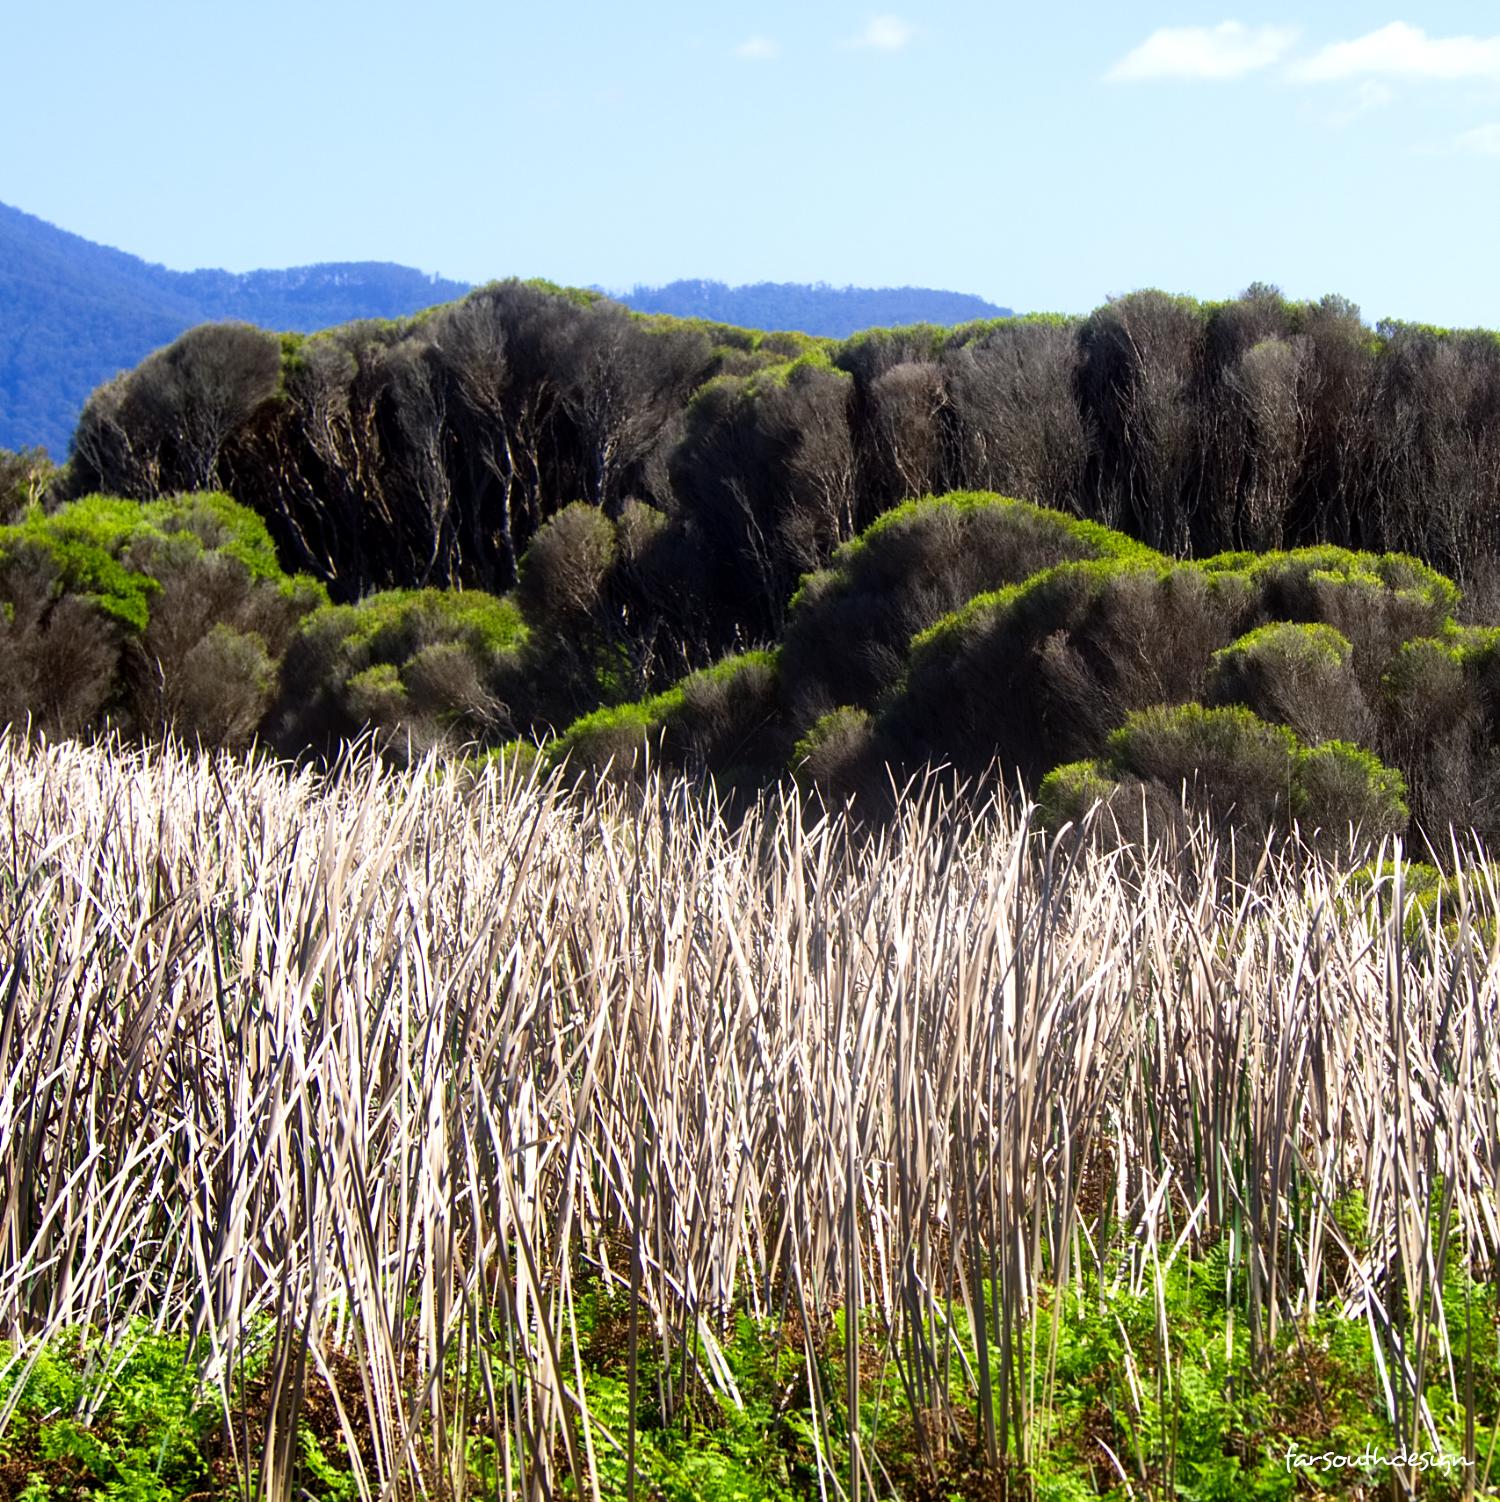 Grass & Tea Tree Textures